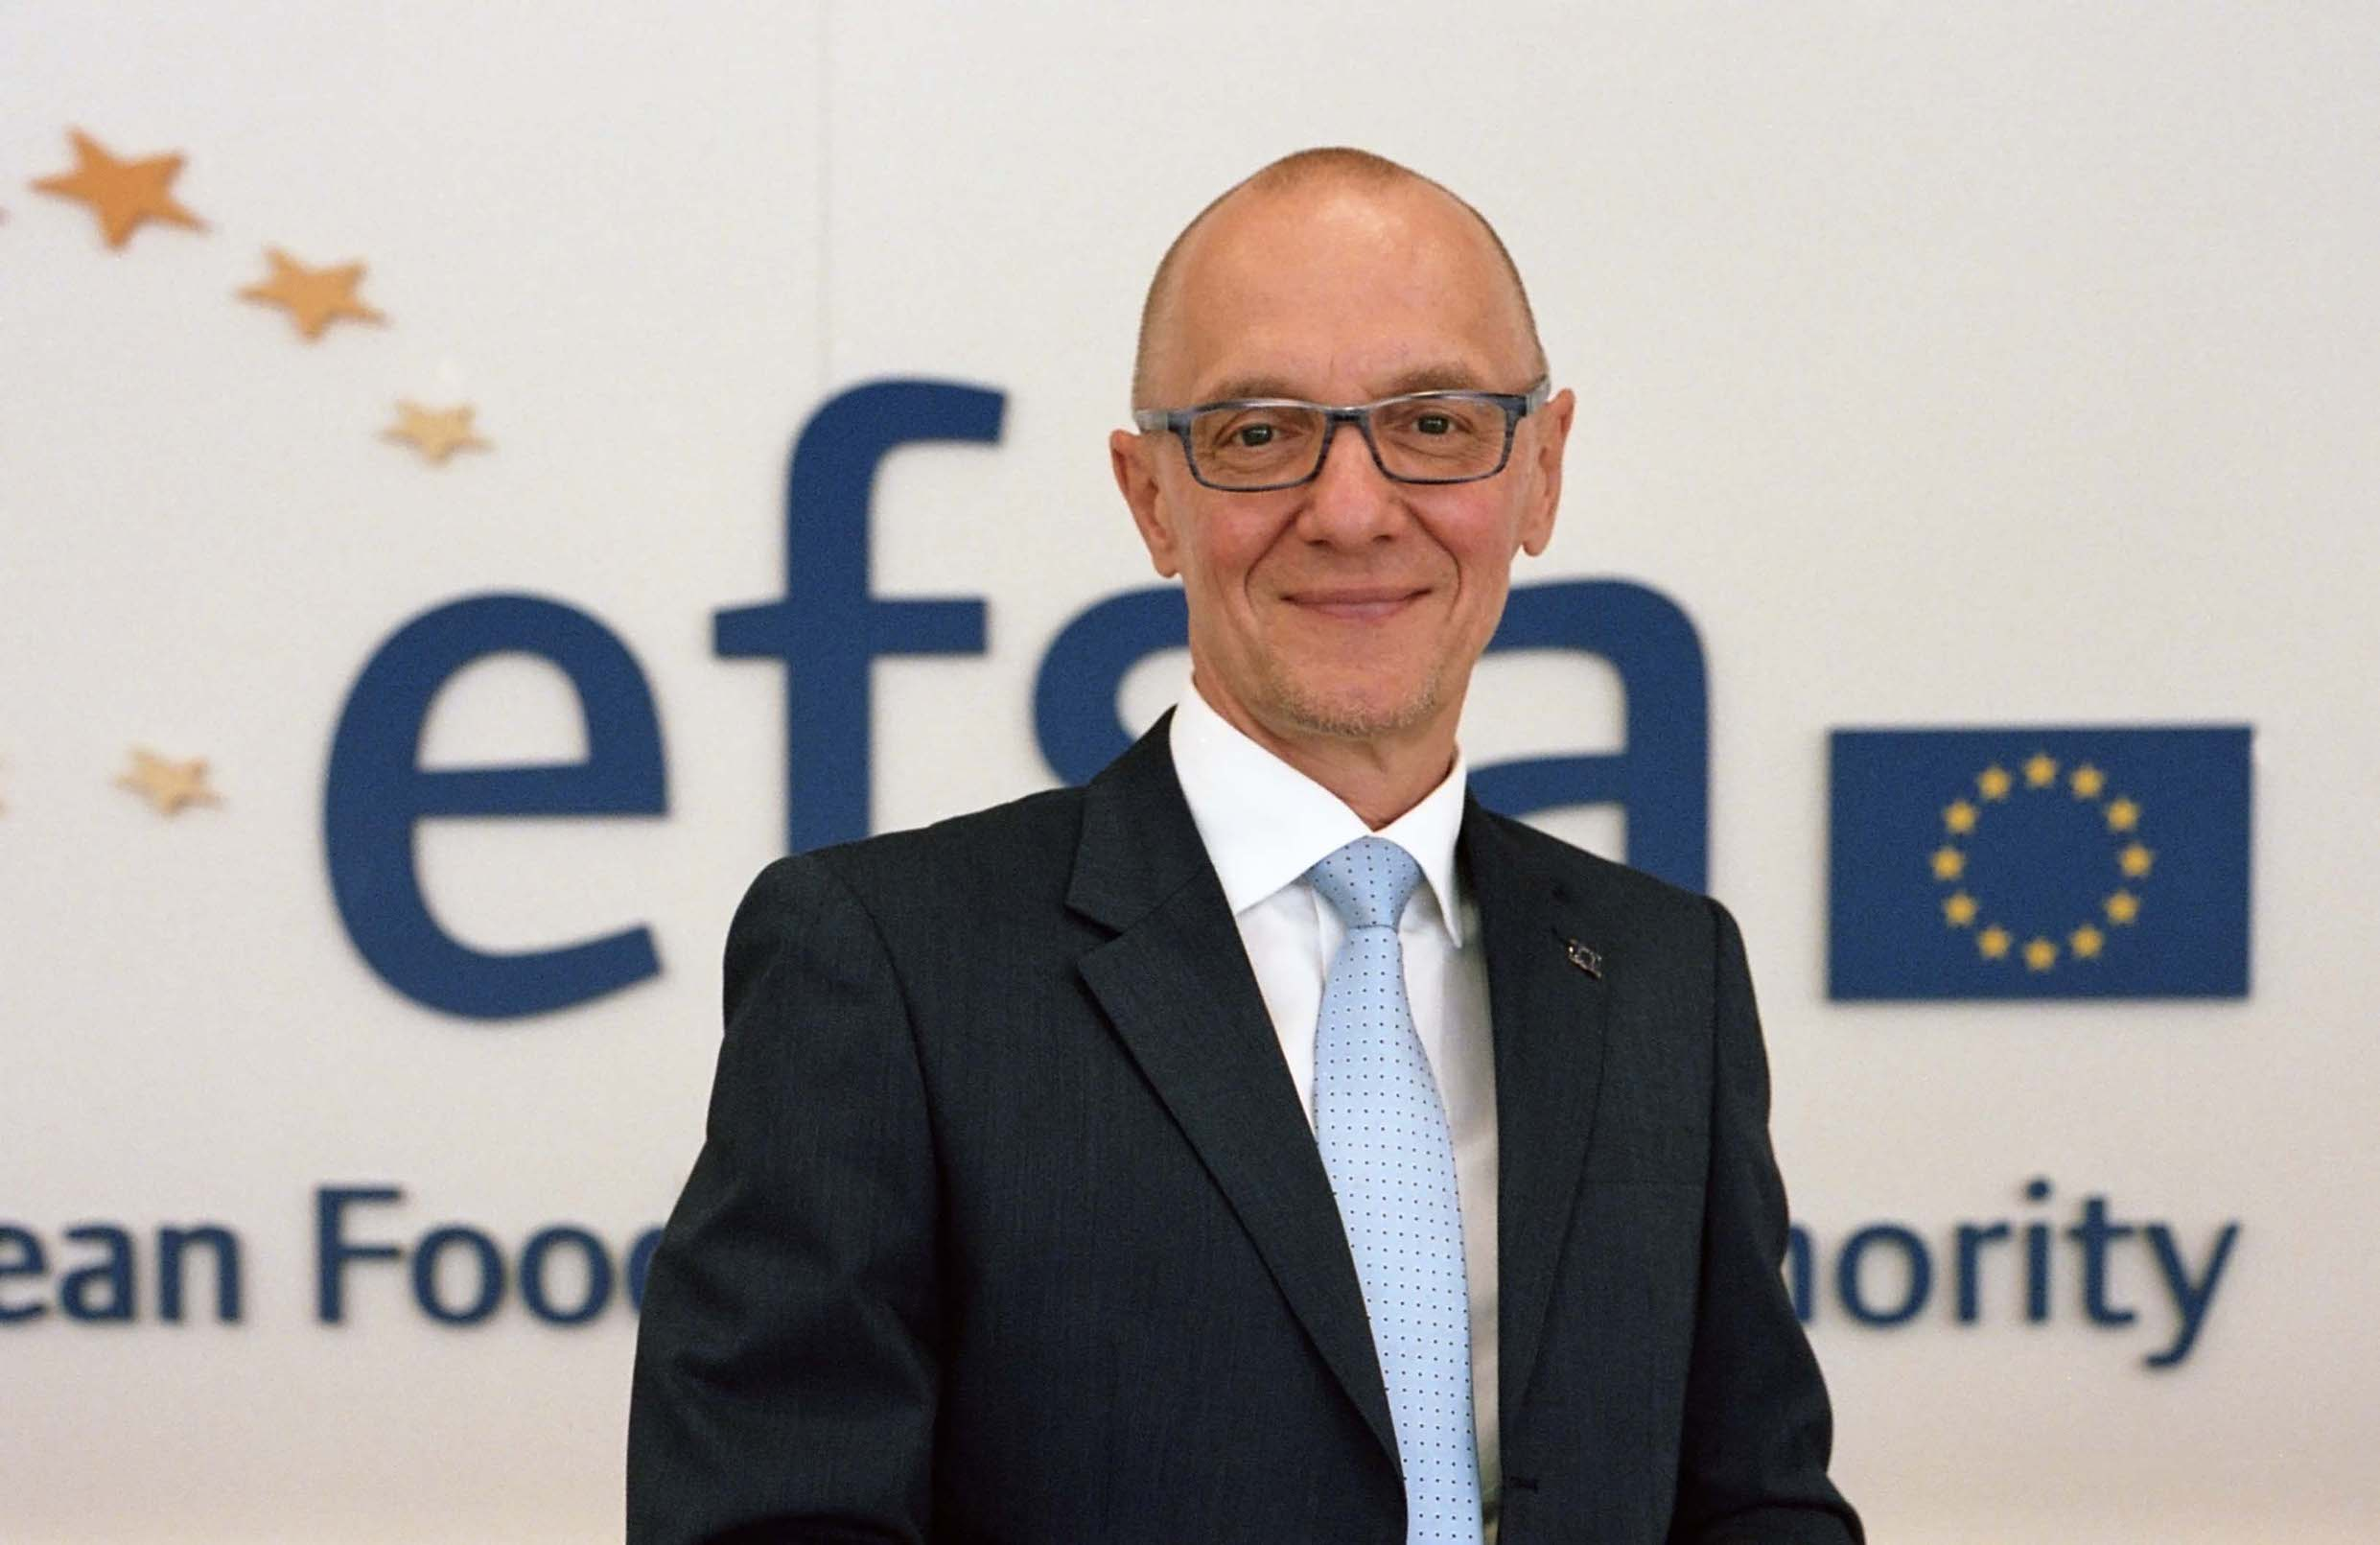 Berhnard Url, glavni ravnatelj Europske agencije za sigurnost hrane